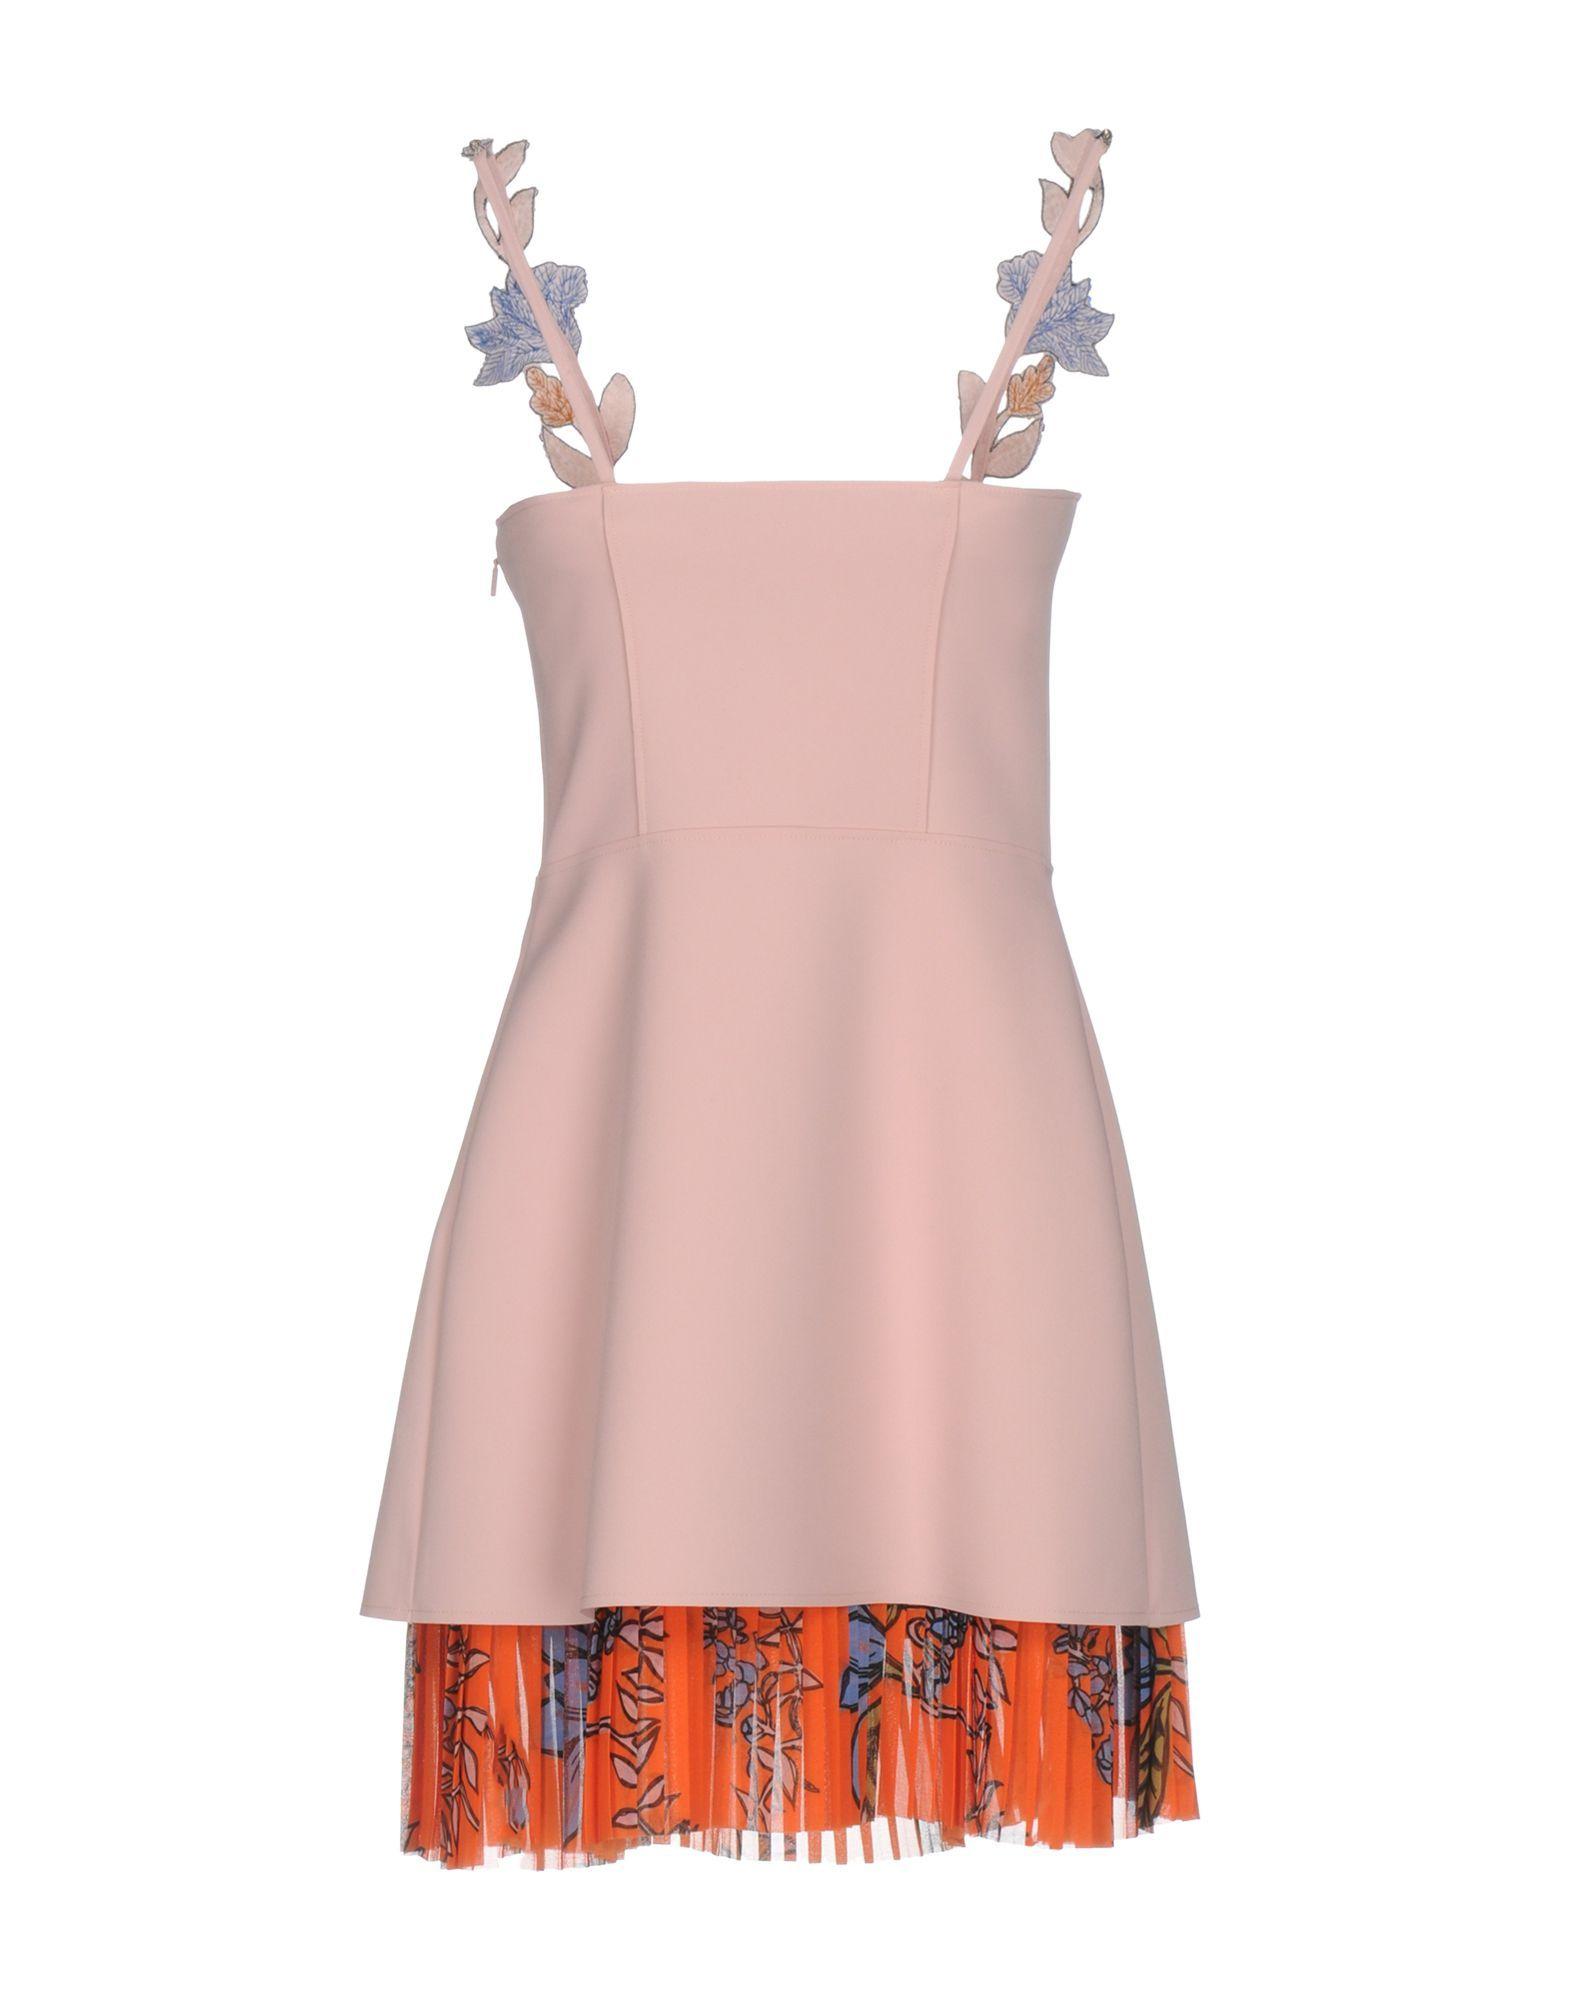 Pinko Pink Camisole Dress